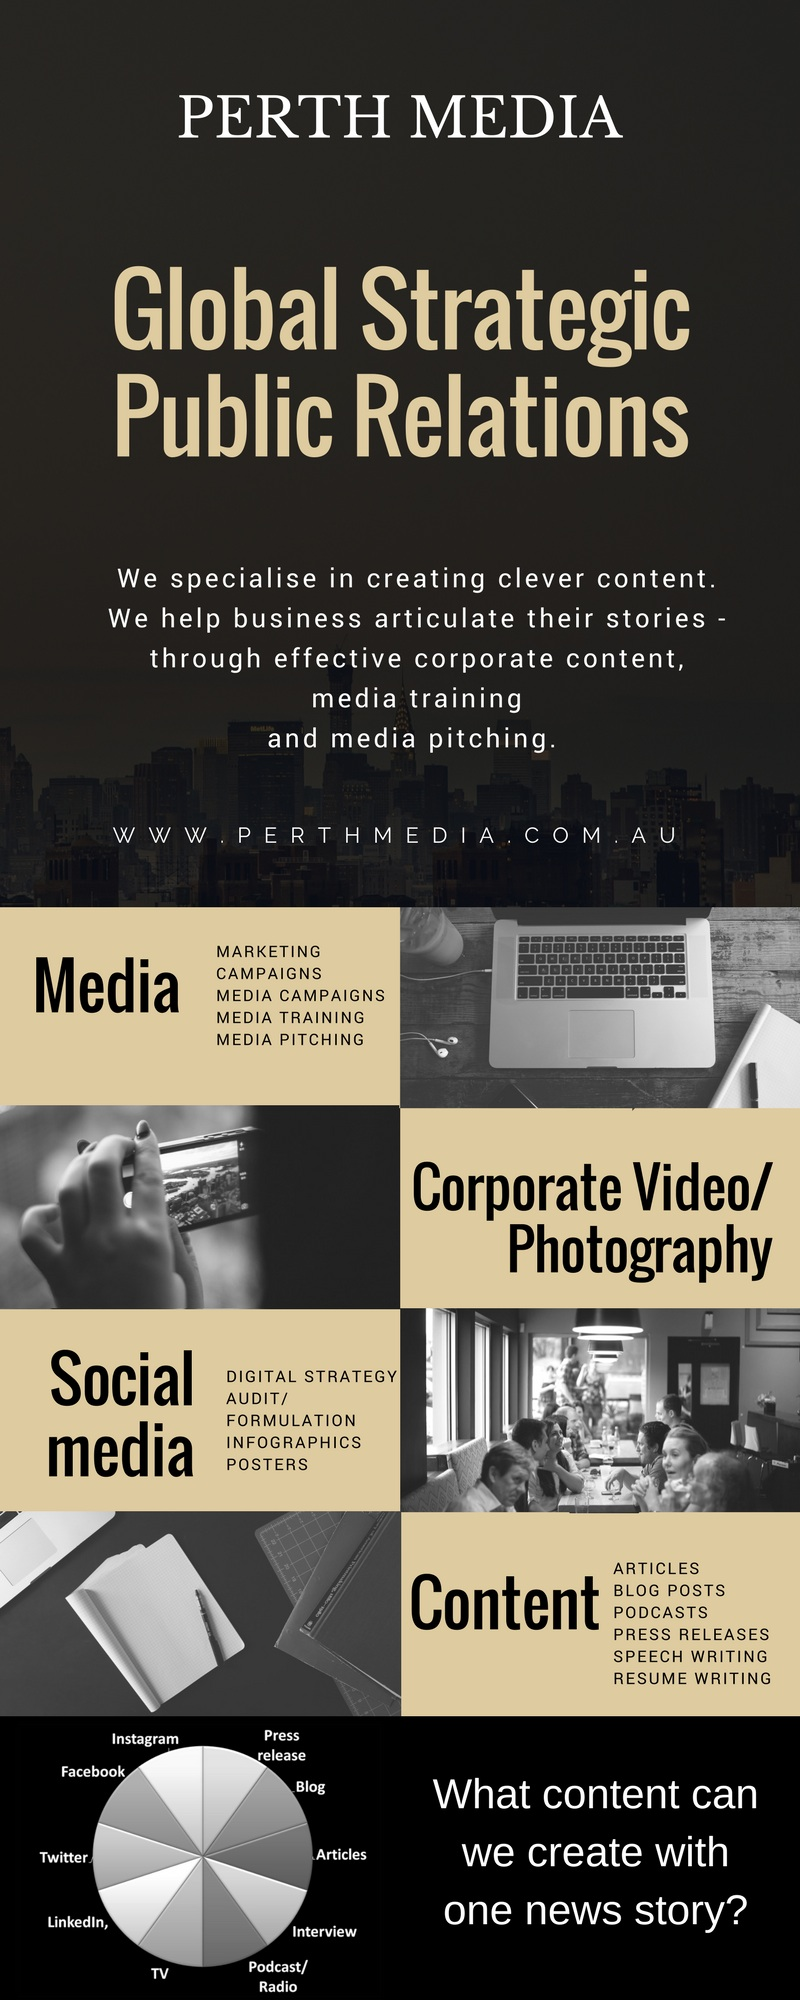 PerthMedia-infographic1.jpg